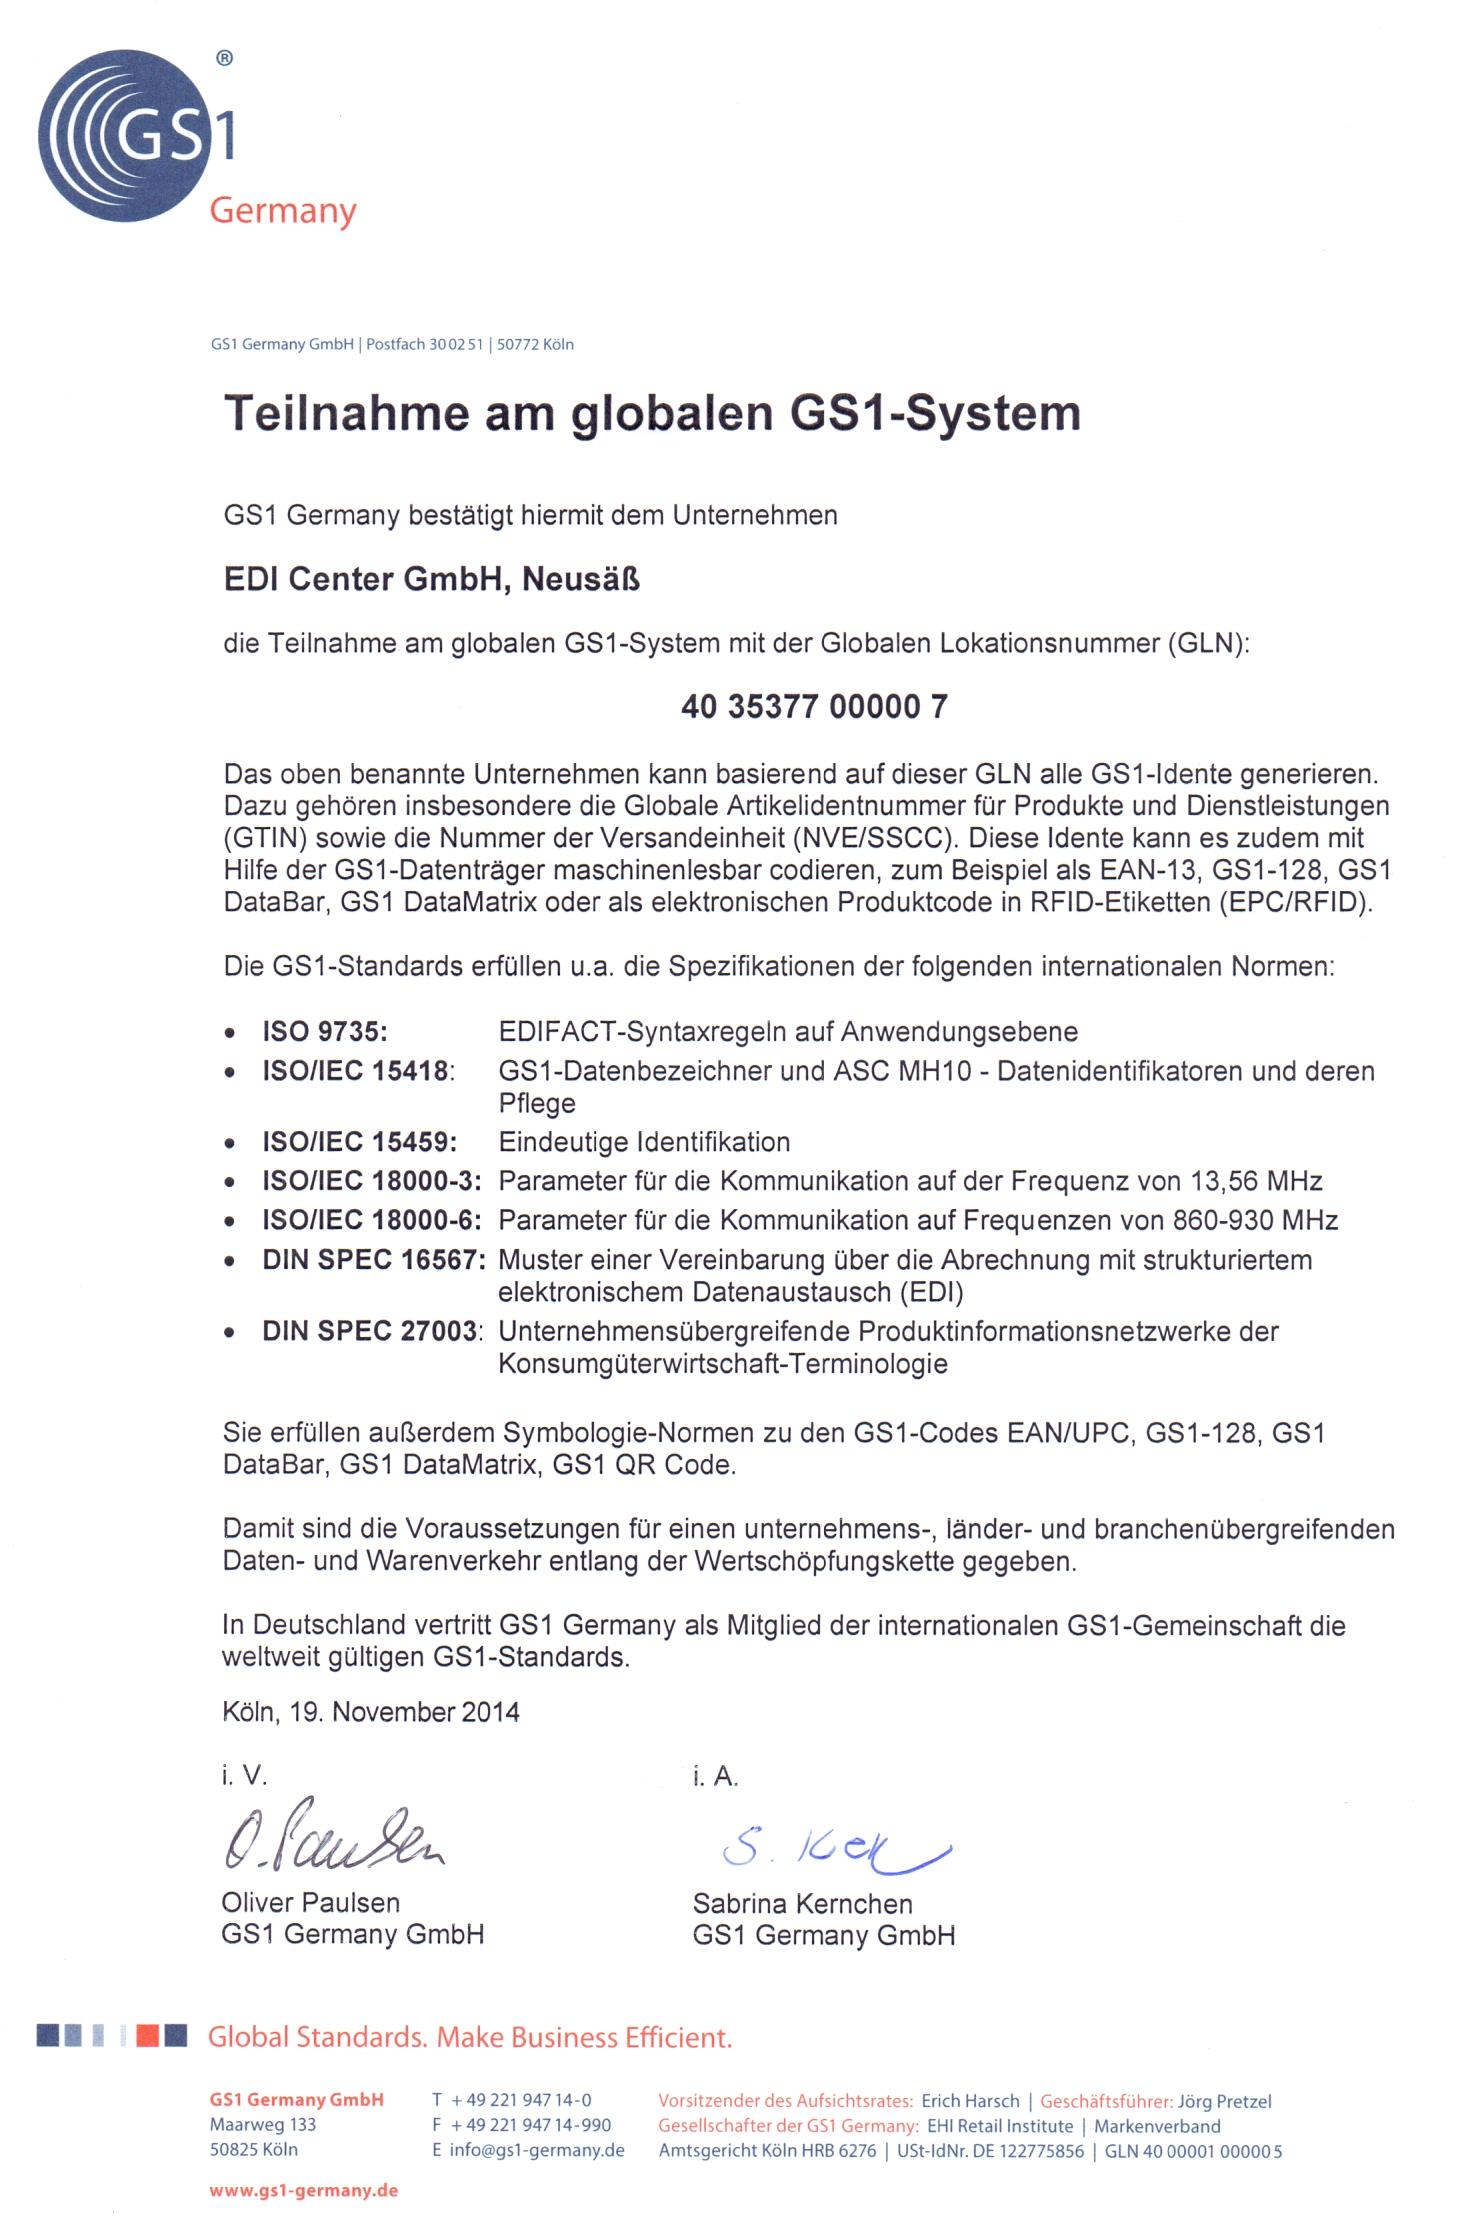 GS1-Zertifikat deutsch